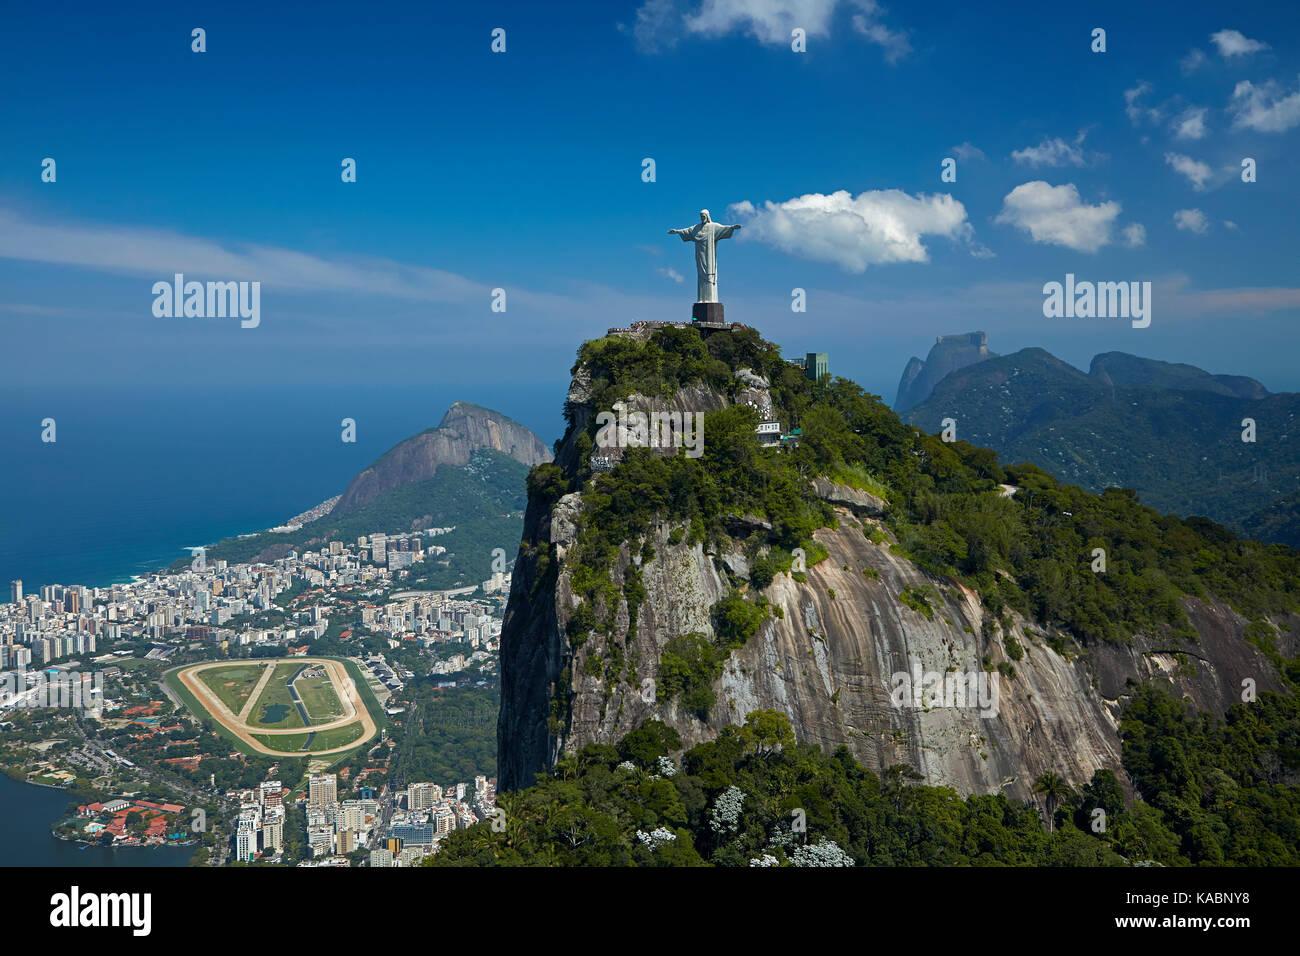 Christ the Redeemer atop Corcovado, and Jockey Club Brasileiro, Rio de Janeiro, Brazil, South America - aerial Stock Photo